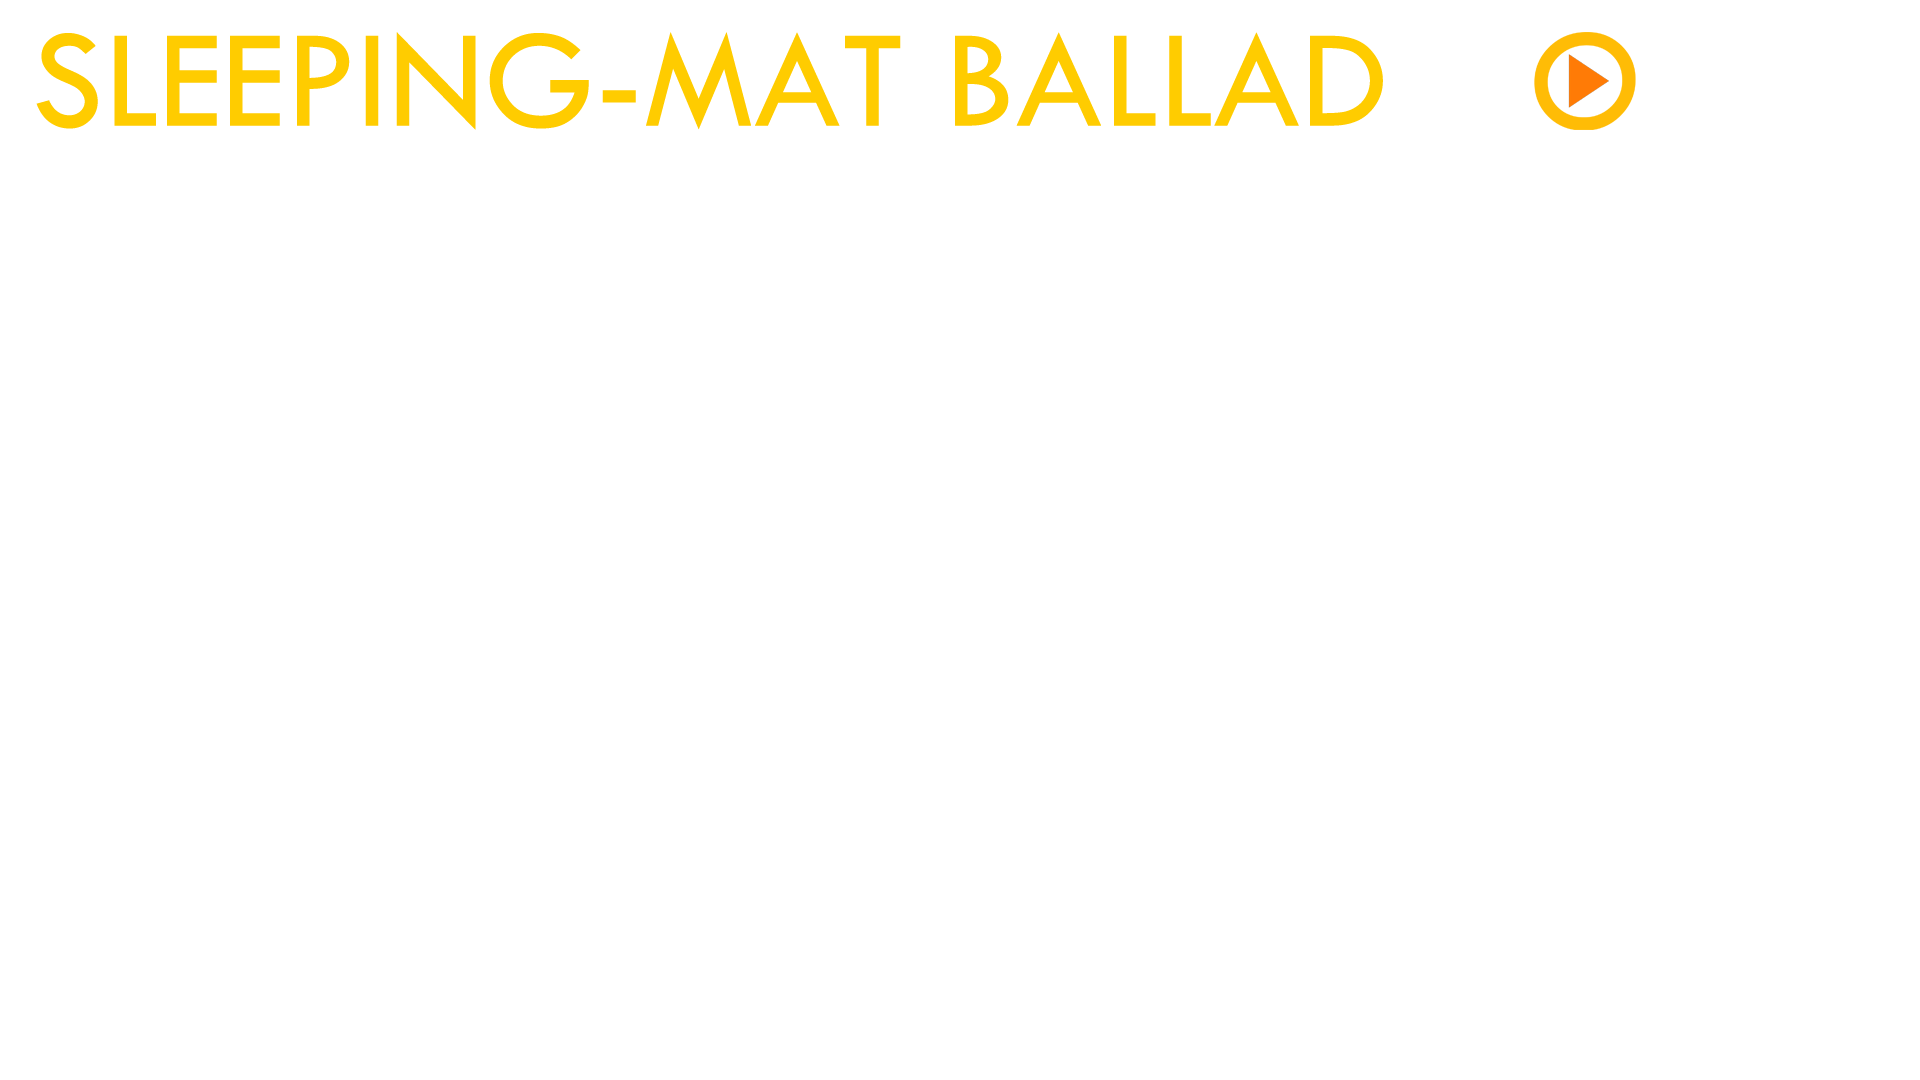 Sleeping-mat-ballad_1920x10